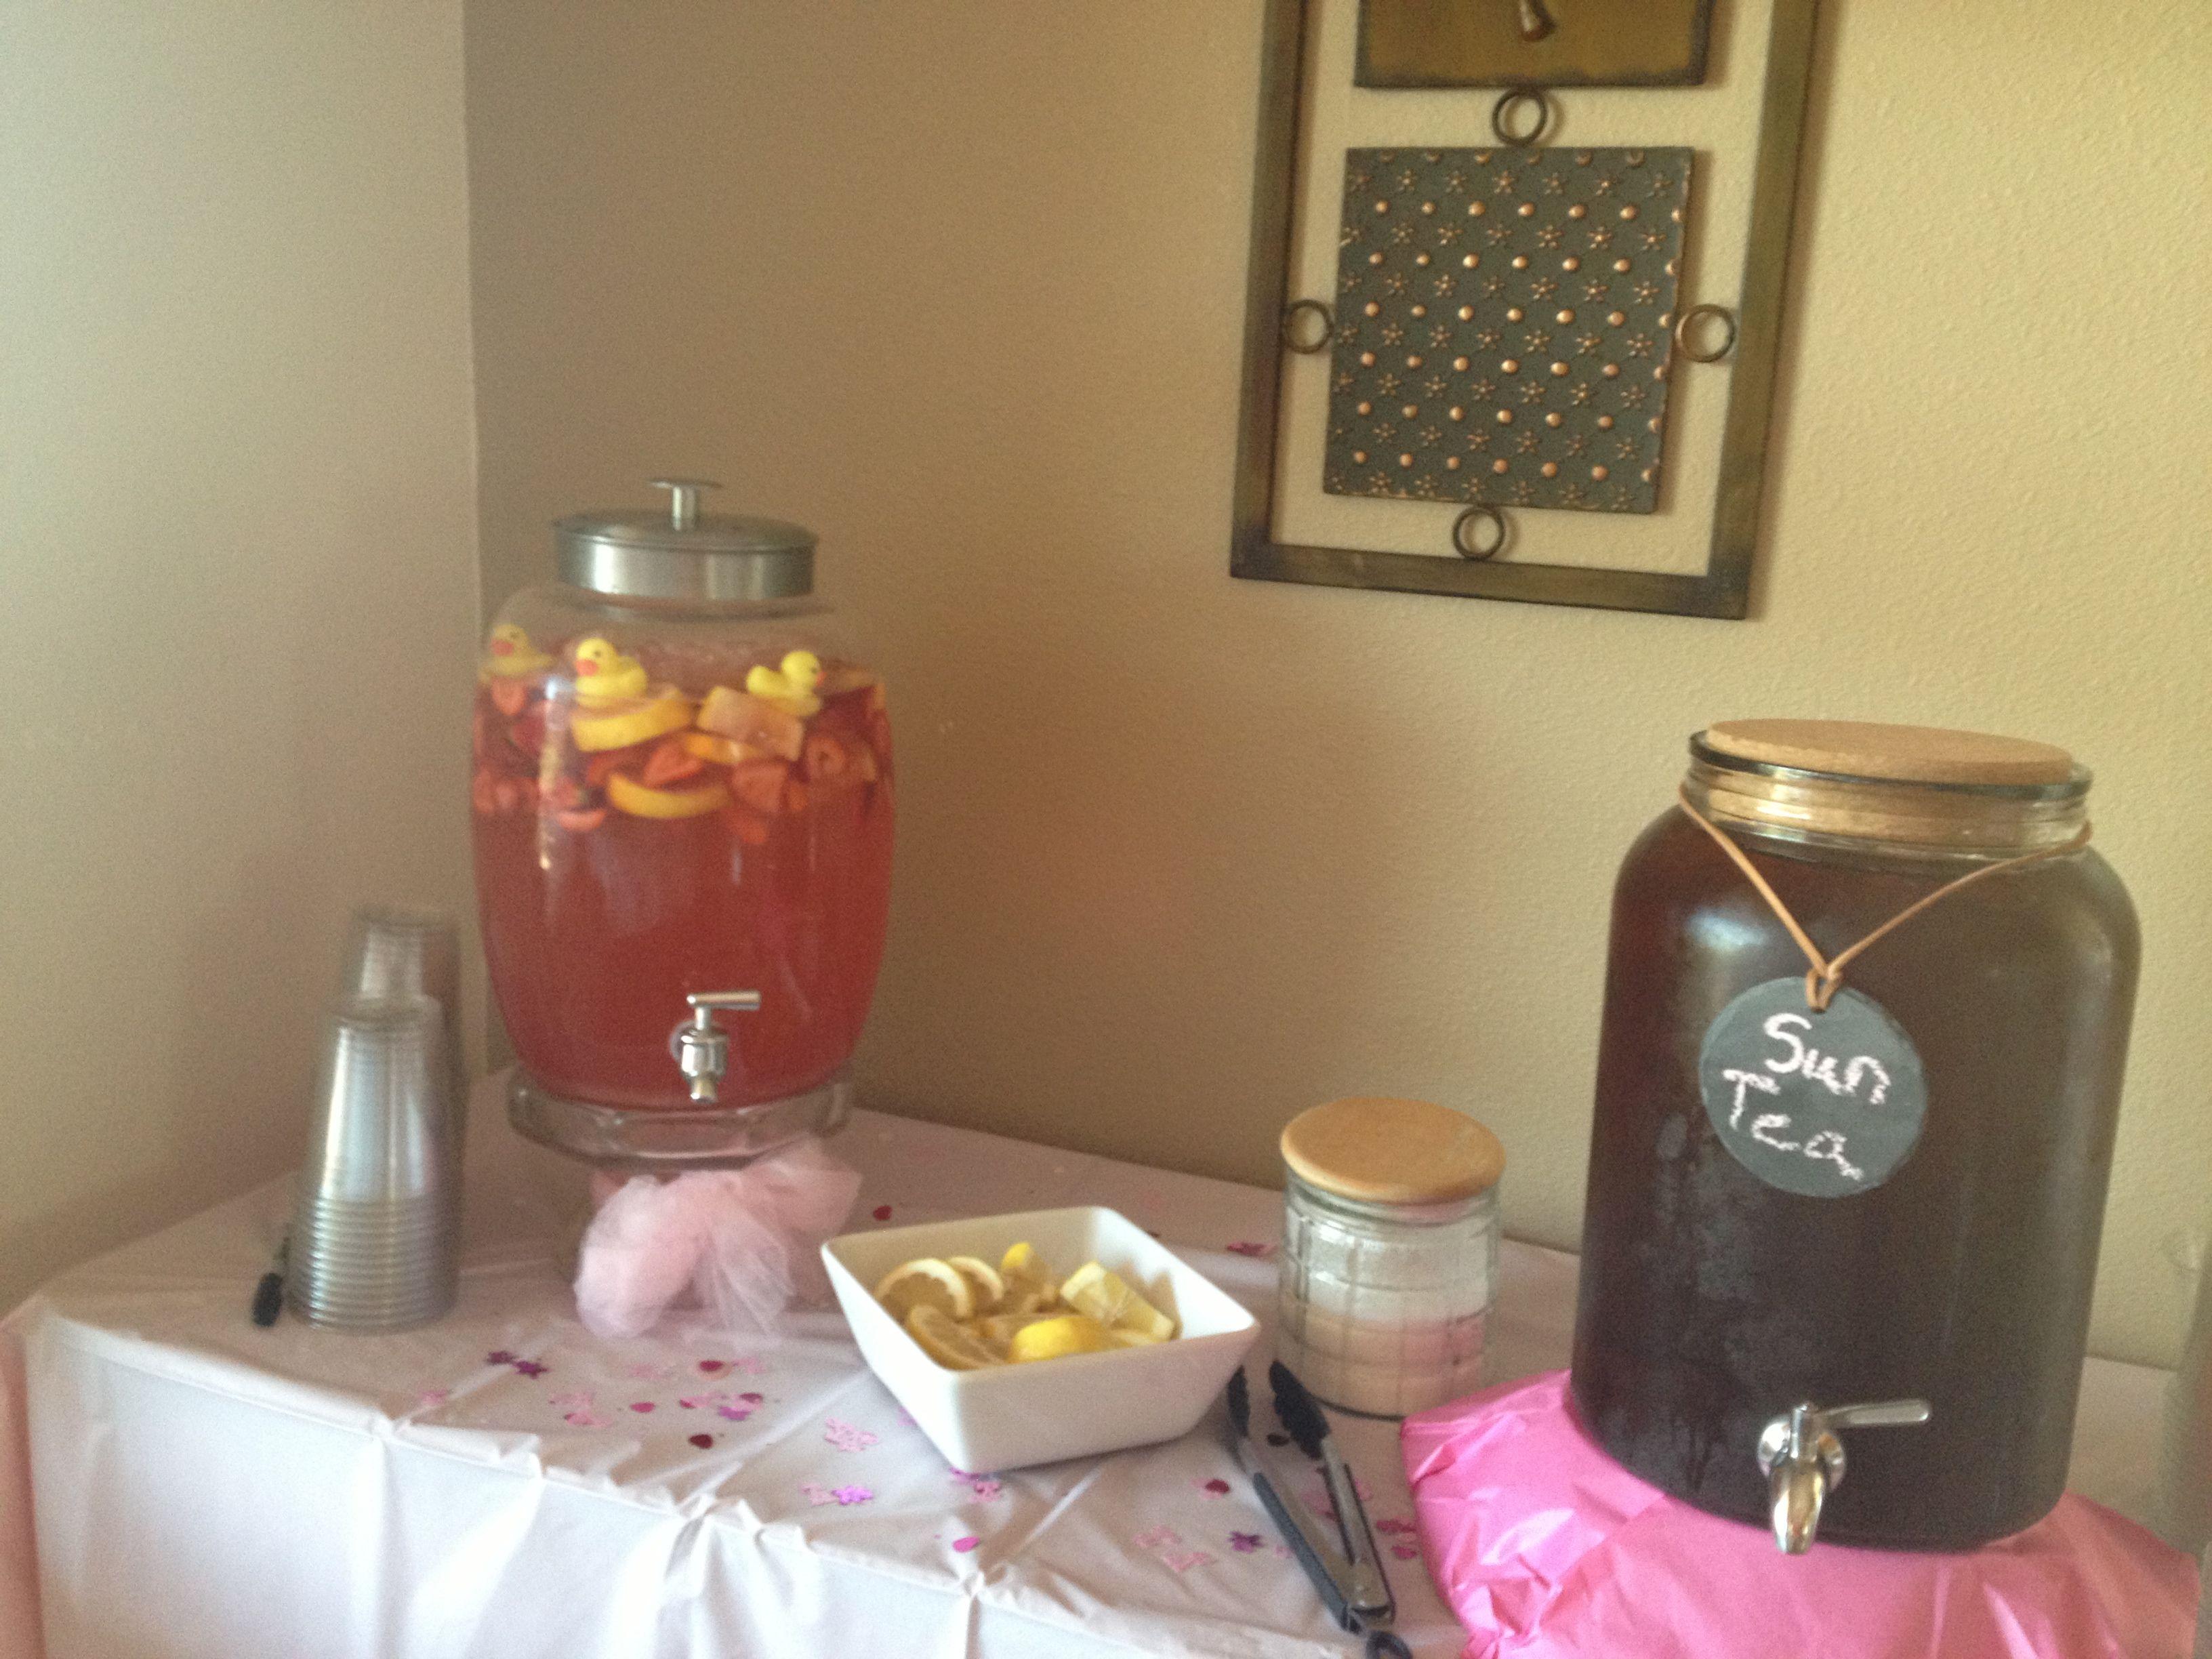 Baby shower idea:) Floating rubber ducks in strawberry lemonade ...